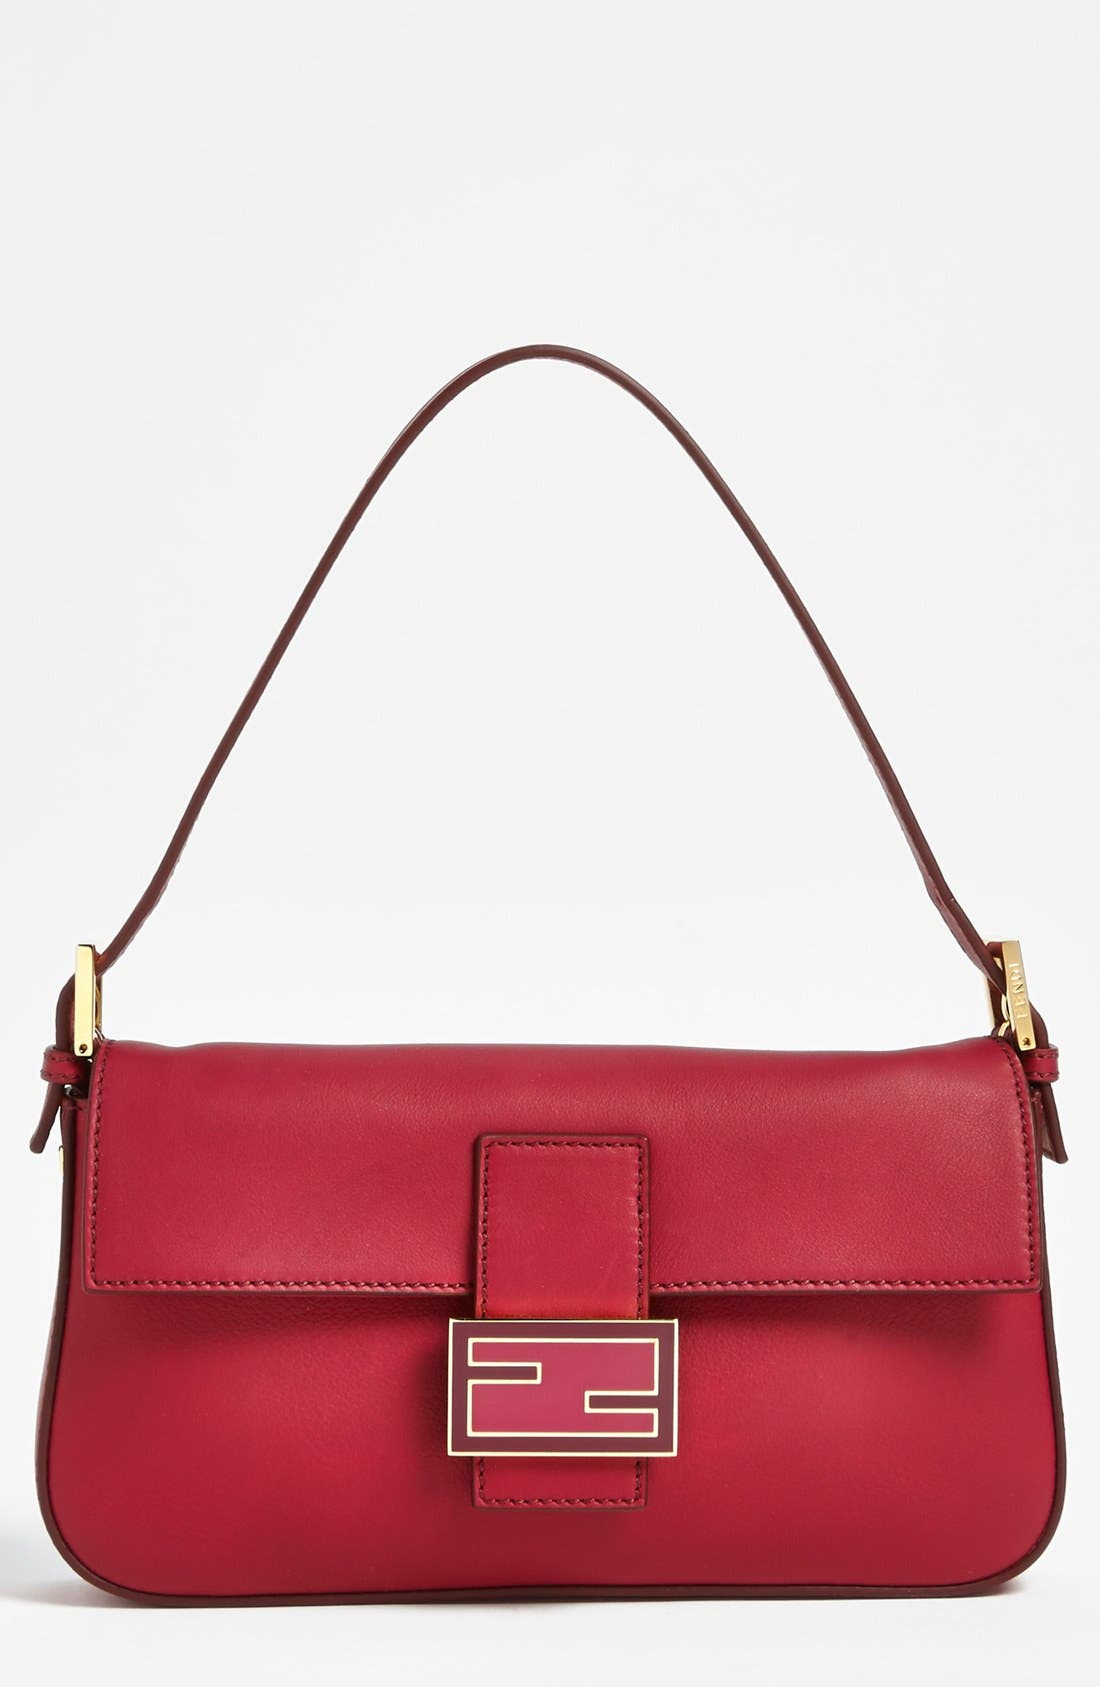 Main Image - Fendi Leather Baguette